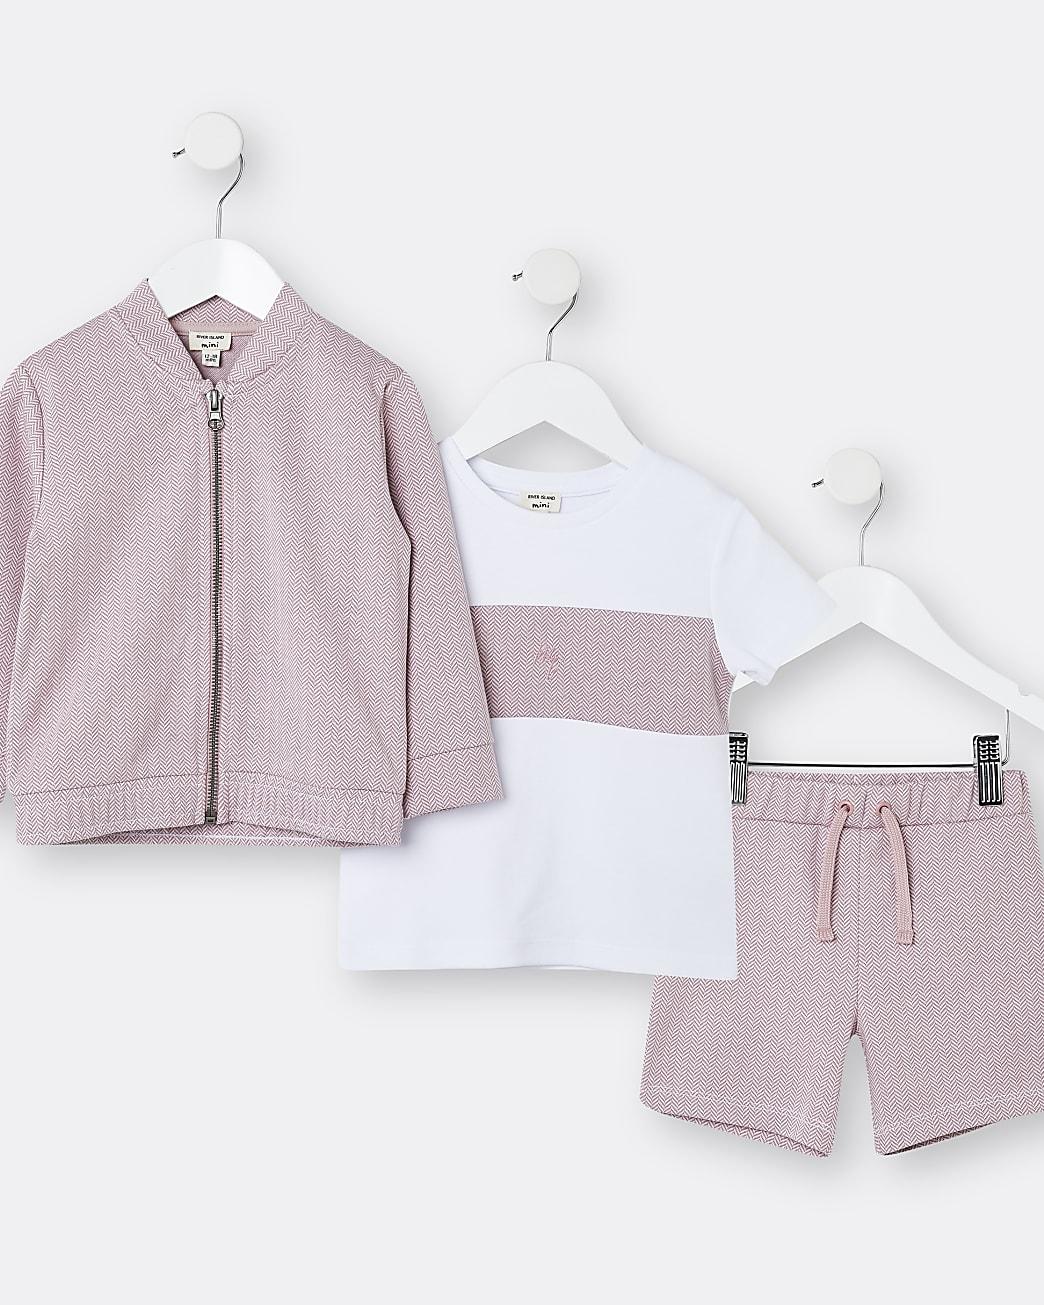 Mini boys pink sweatshirt 3 piece outfit